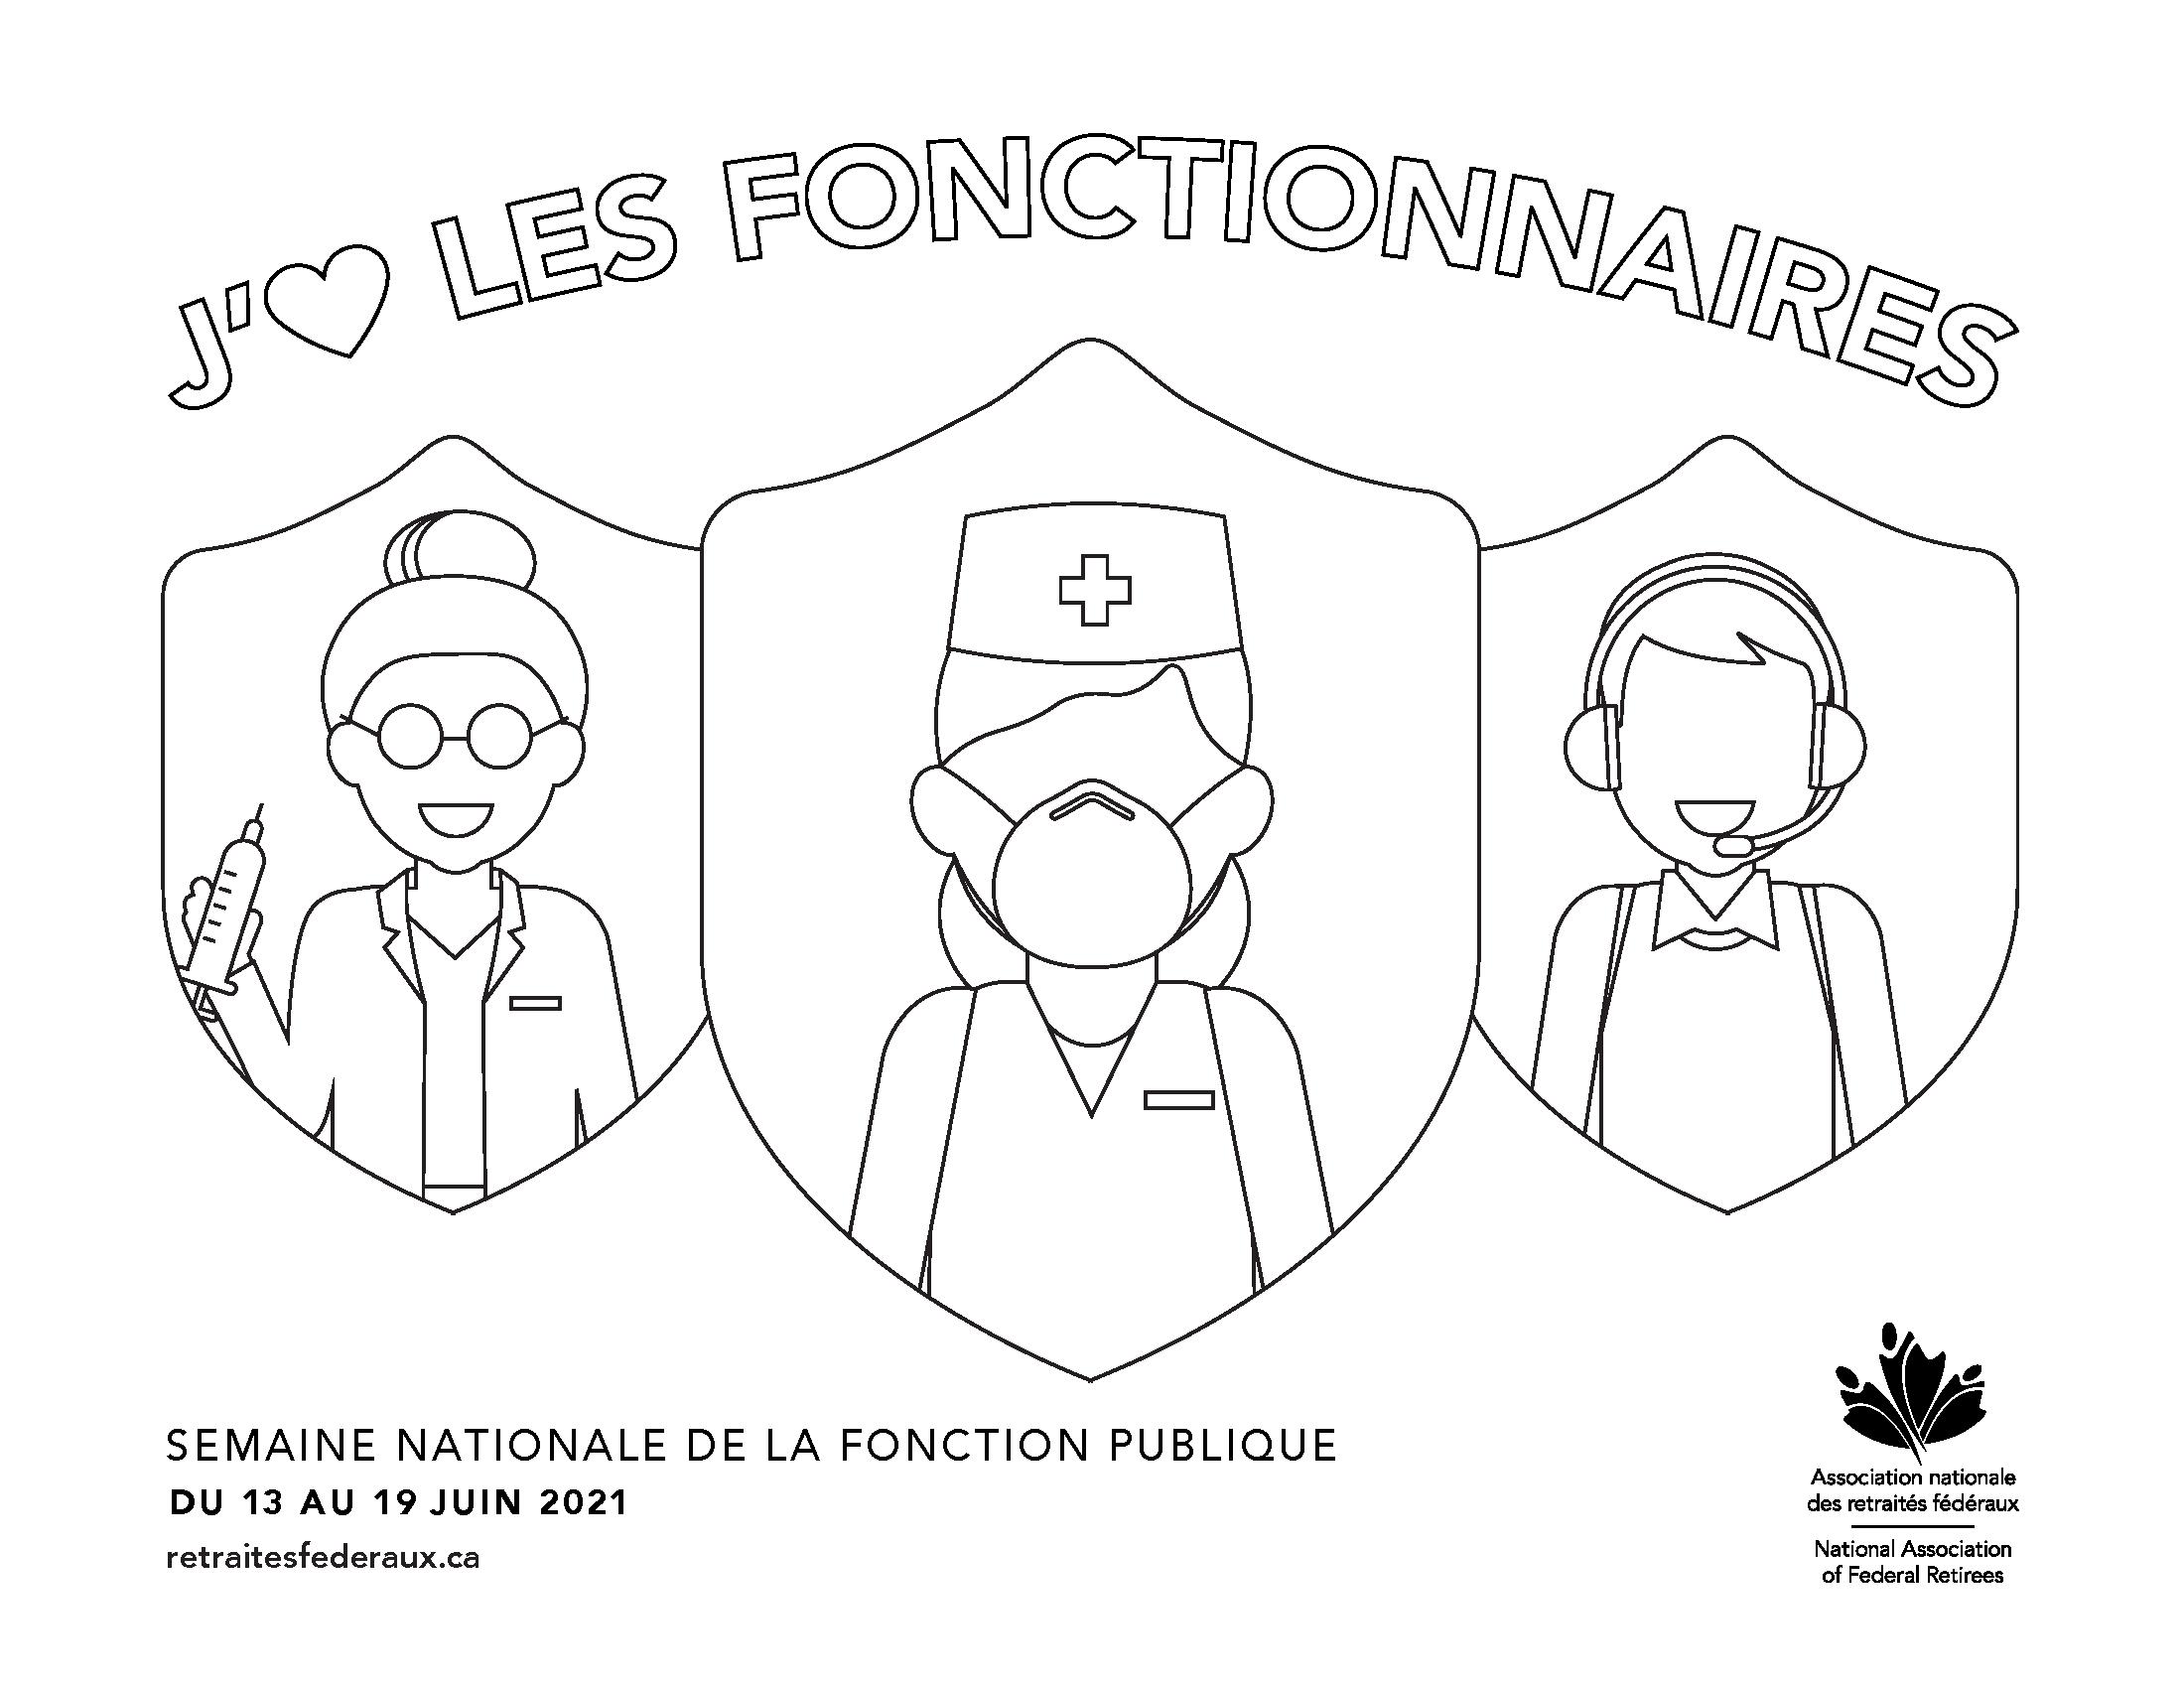 Retraités Fédéraux SNFP poster.